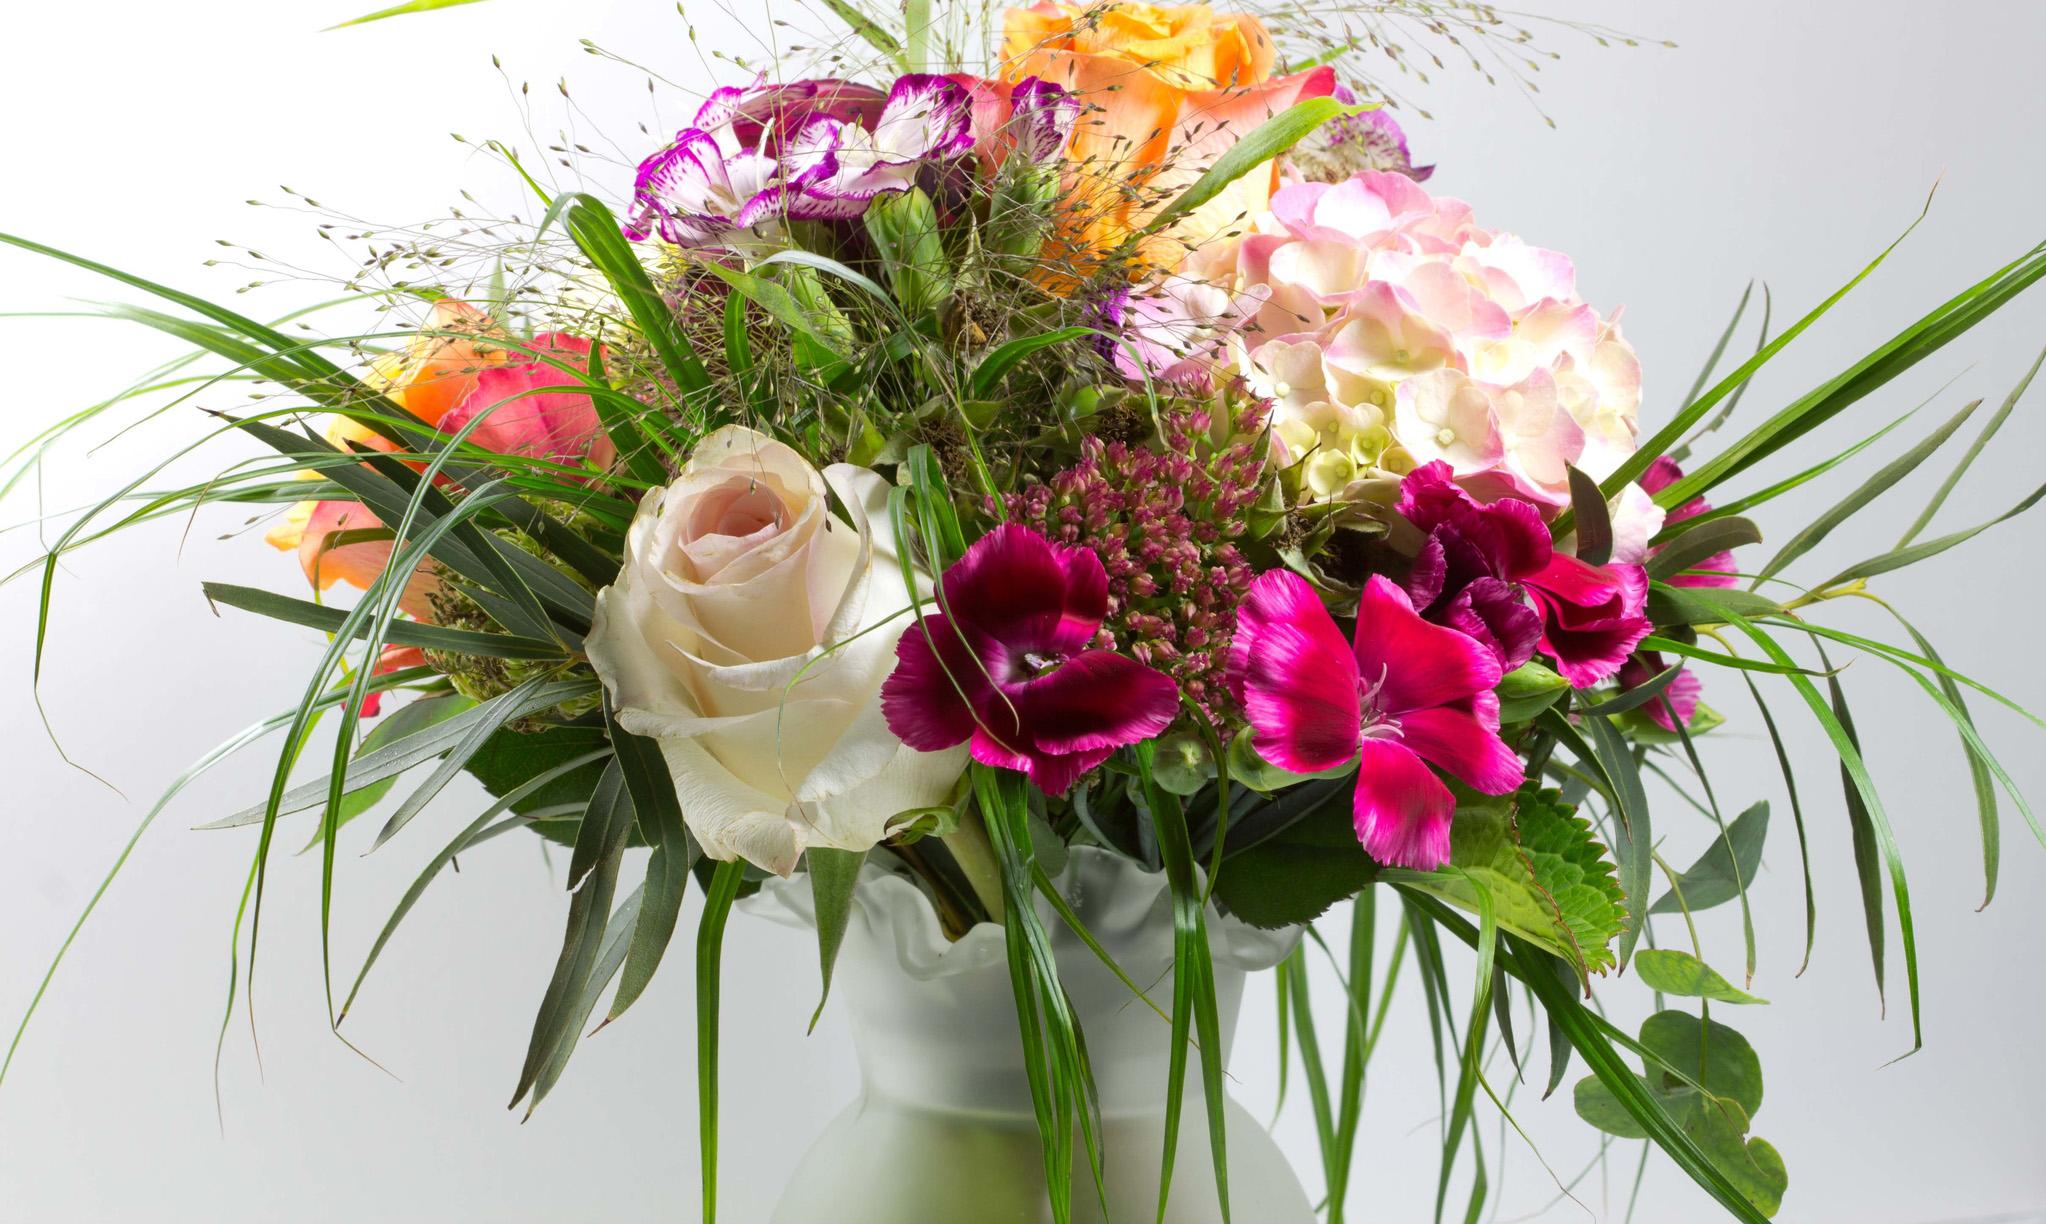 Flower Design From The Garden Bellevue Botanical Garden